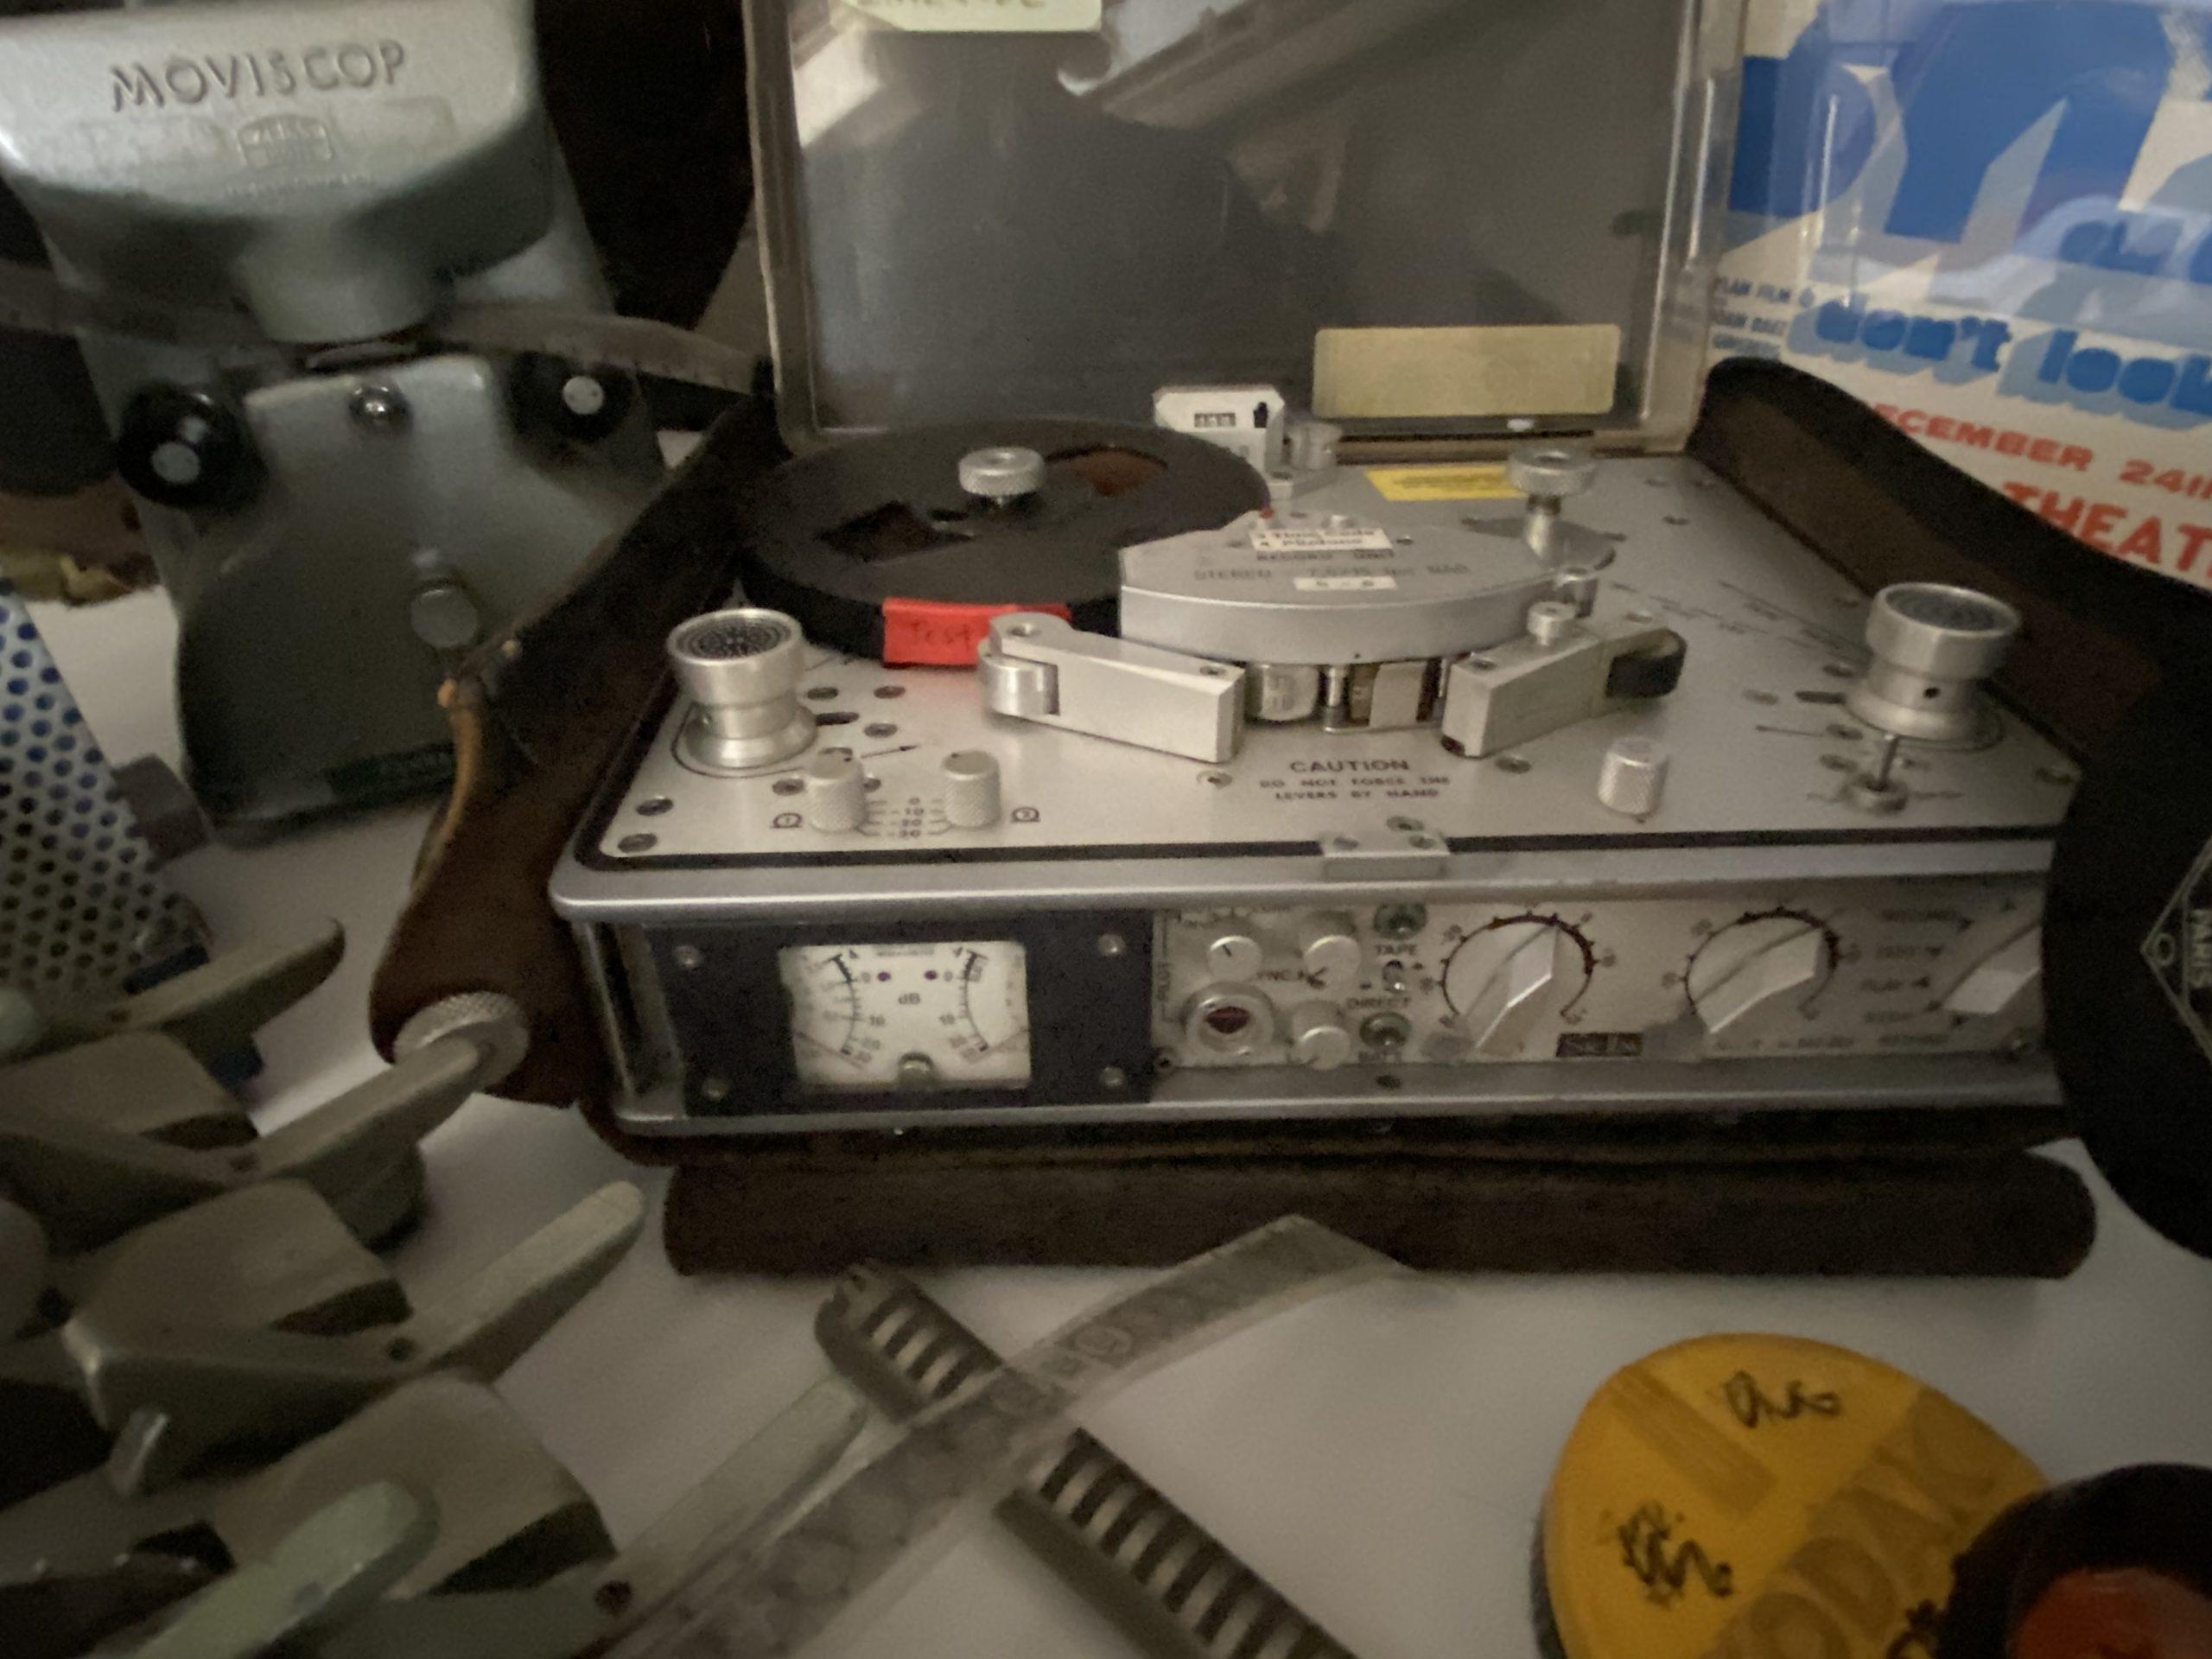 A film recorder belonging to Chris Hegedus.